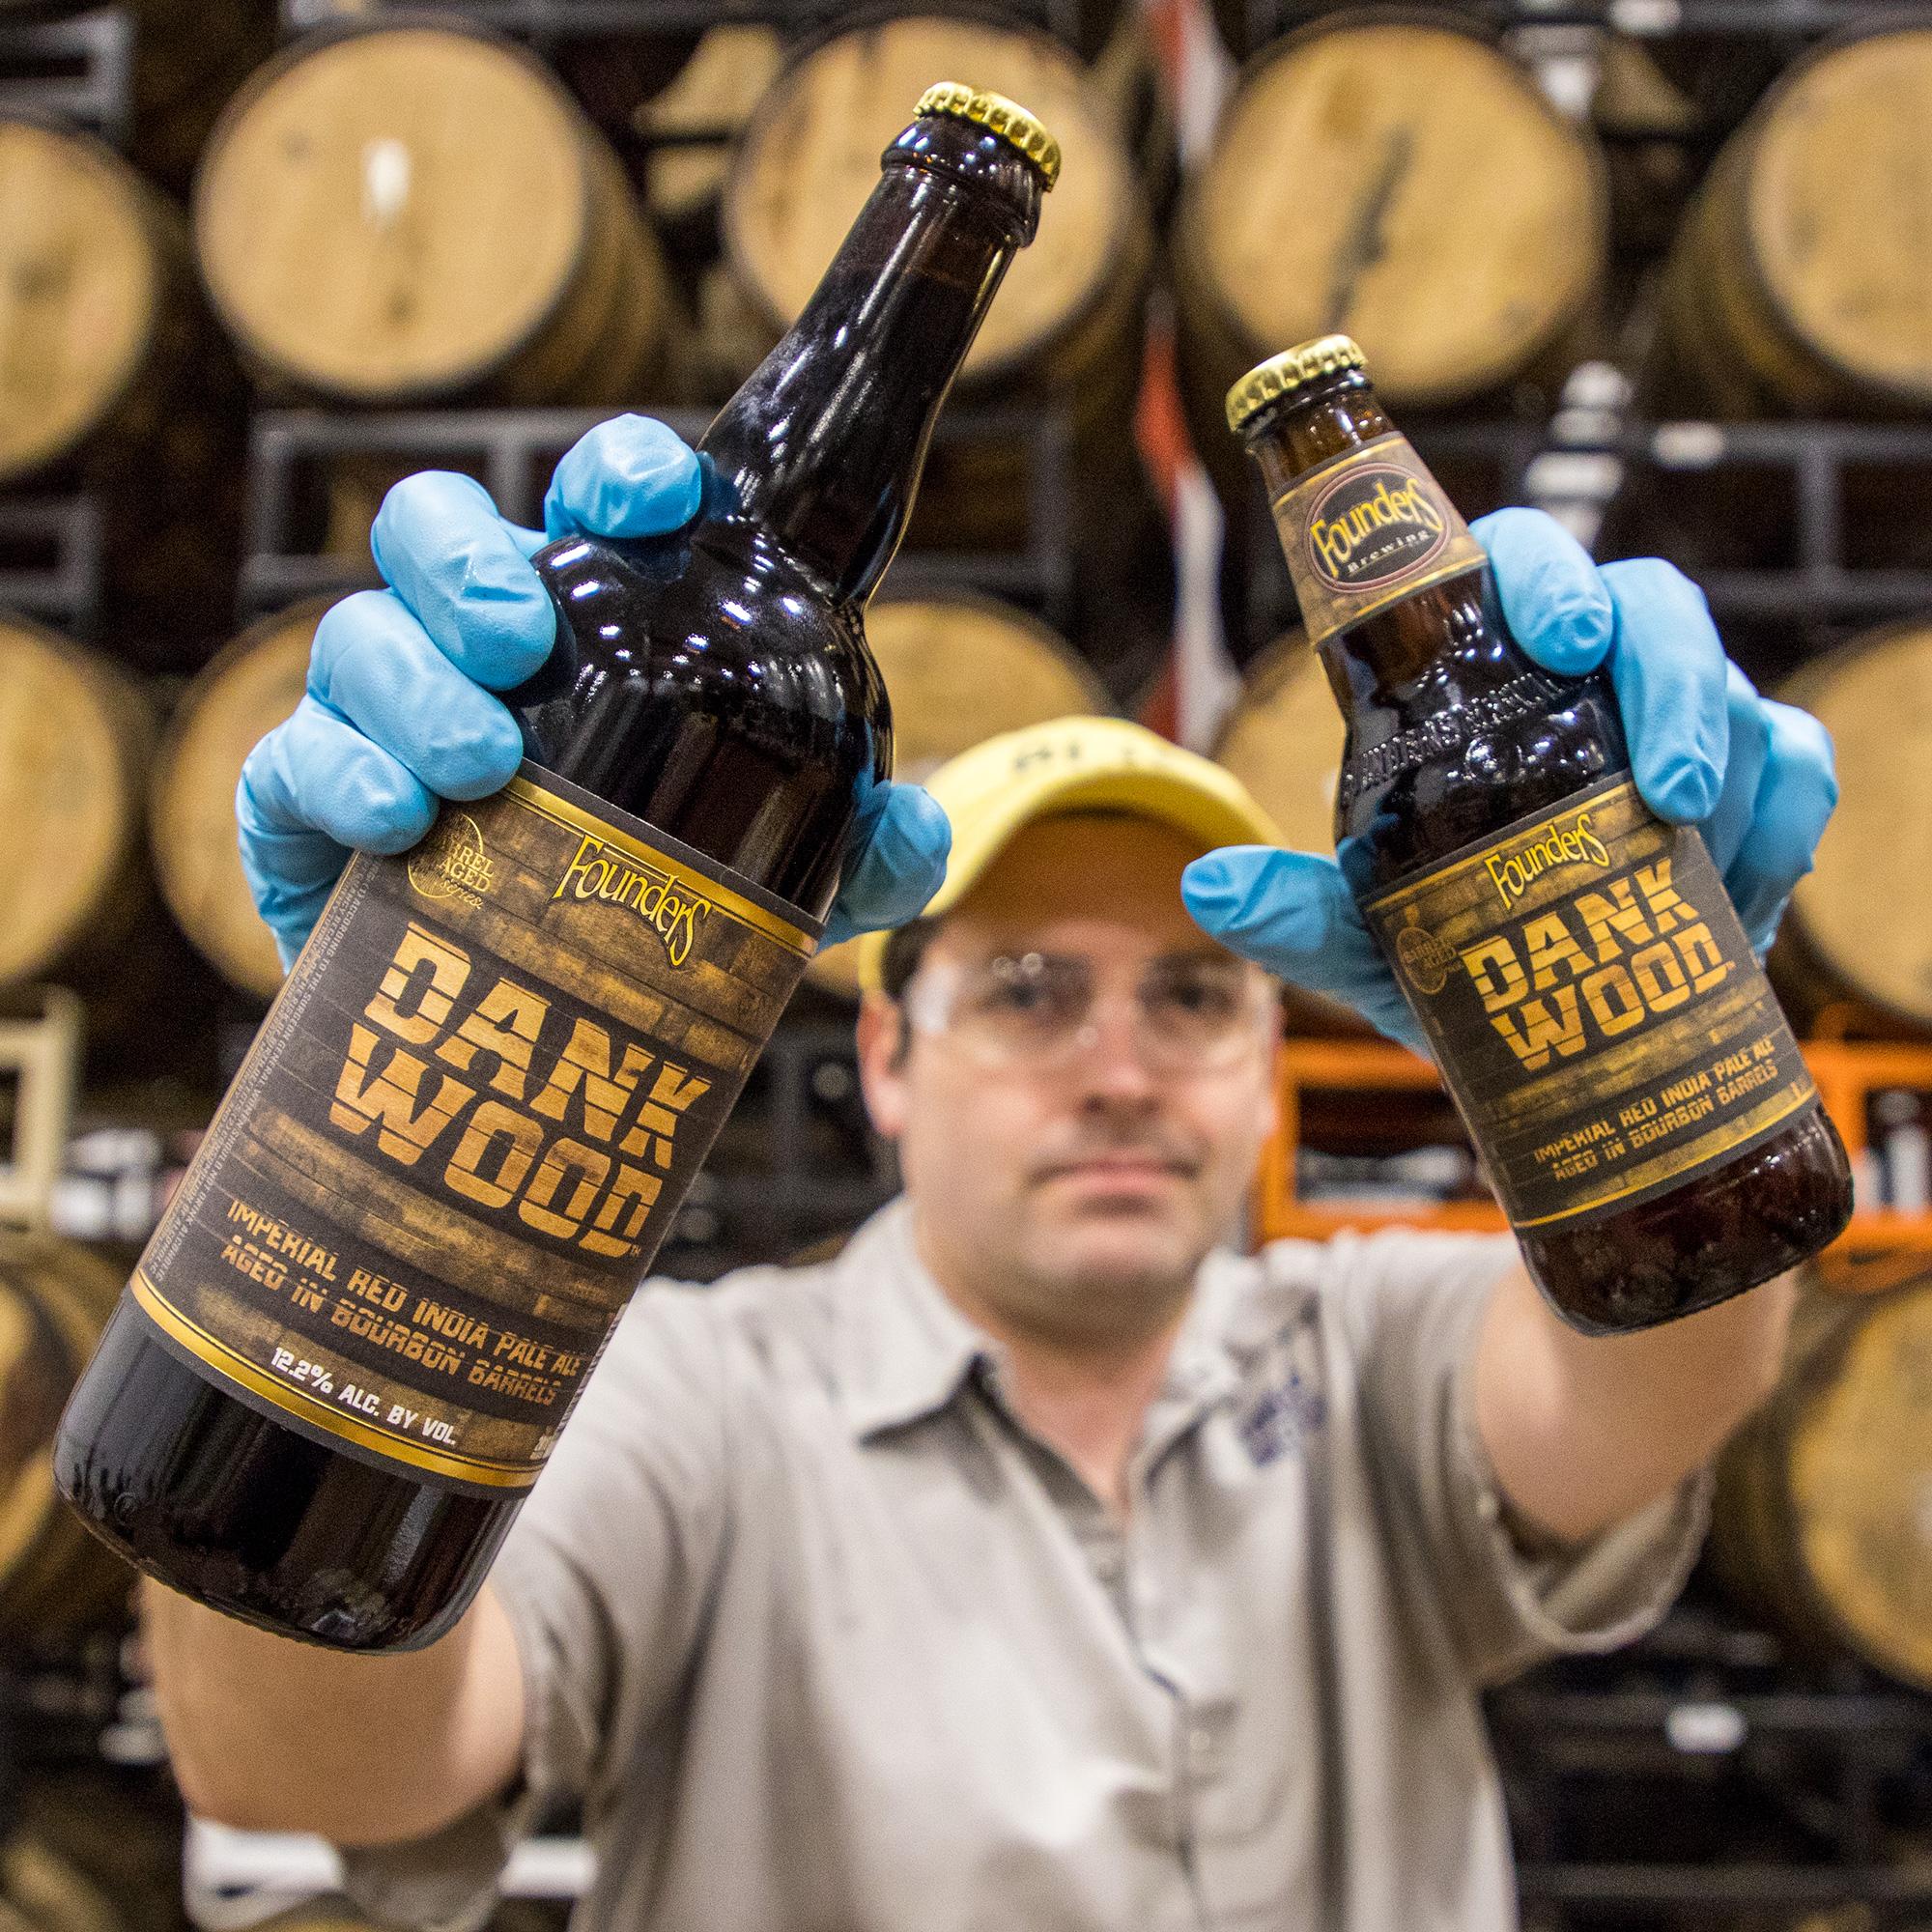 Man holding bottles of Founders Dank Wood